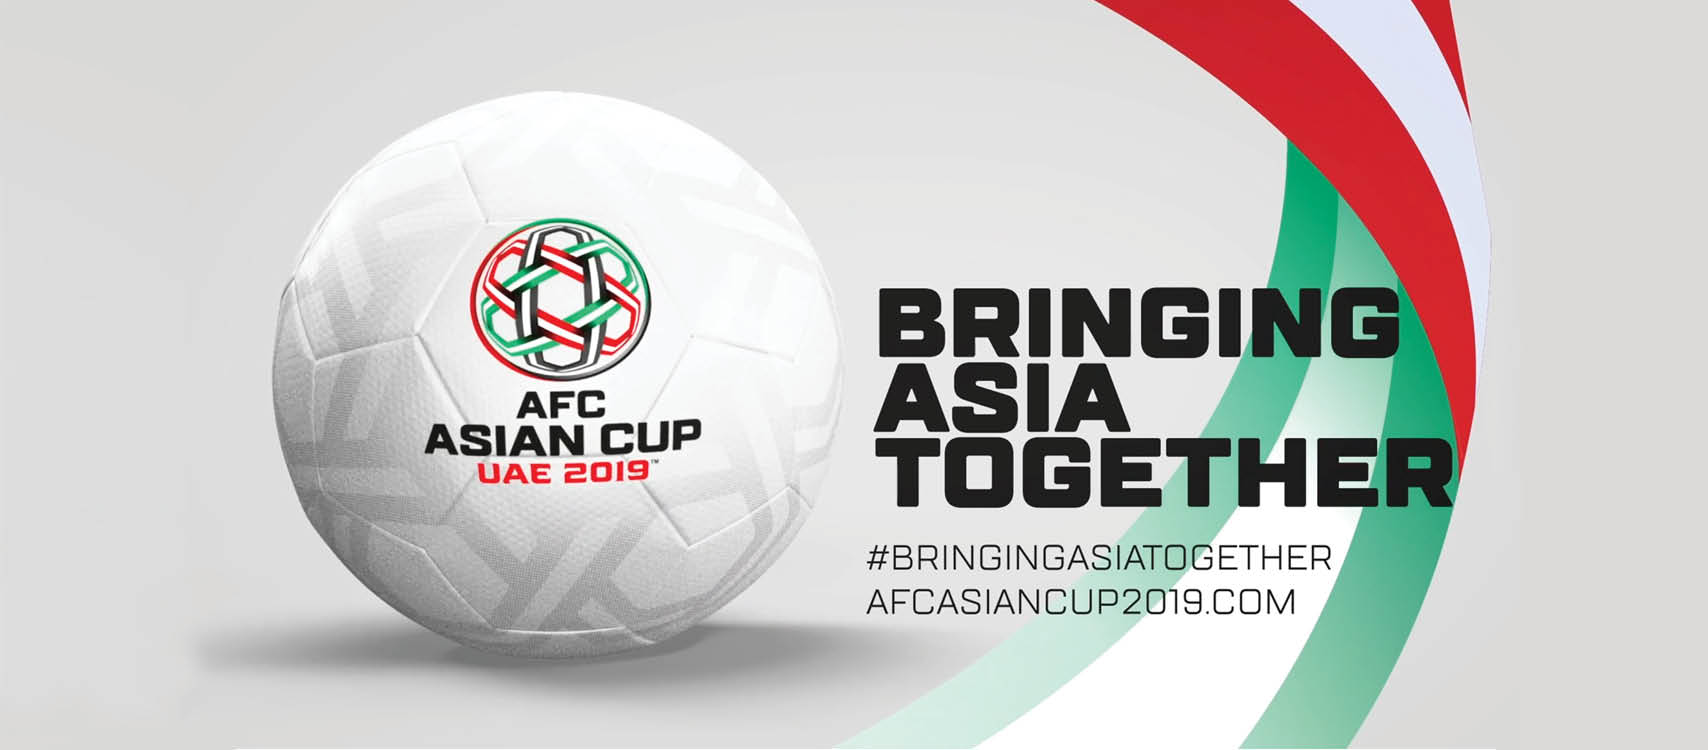 Coppa d'Asia 2019